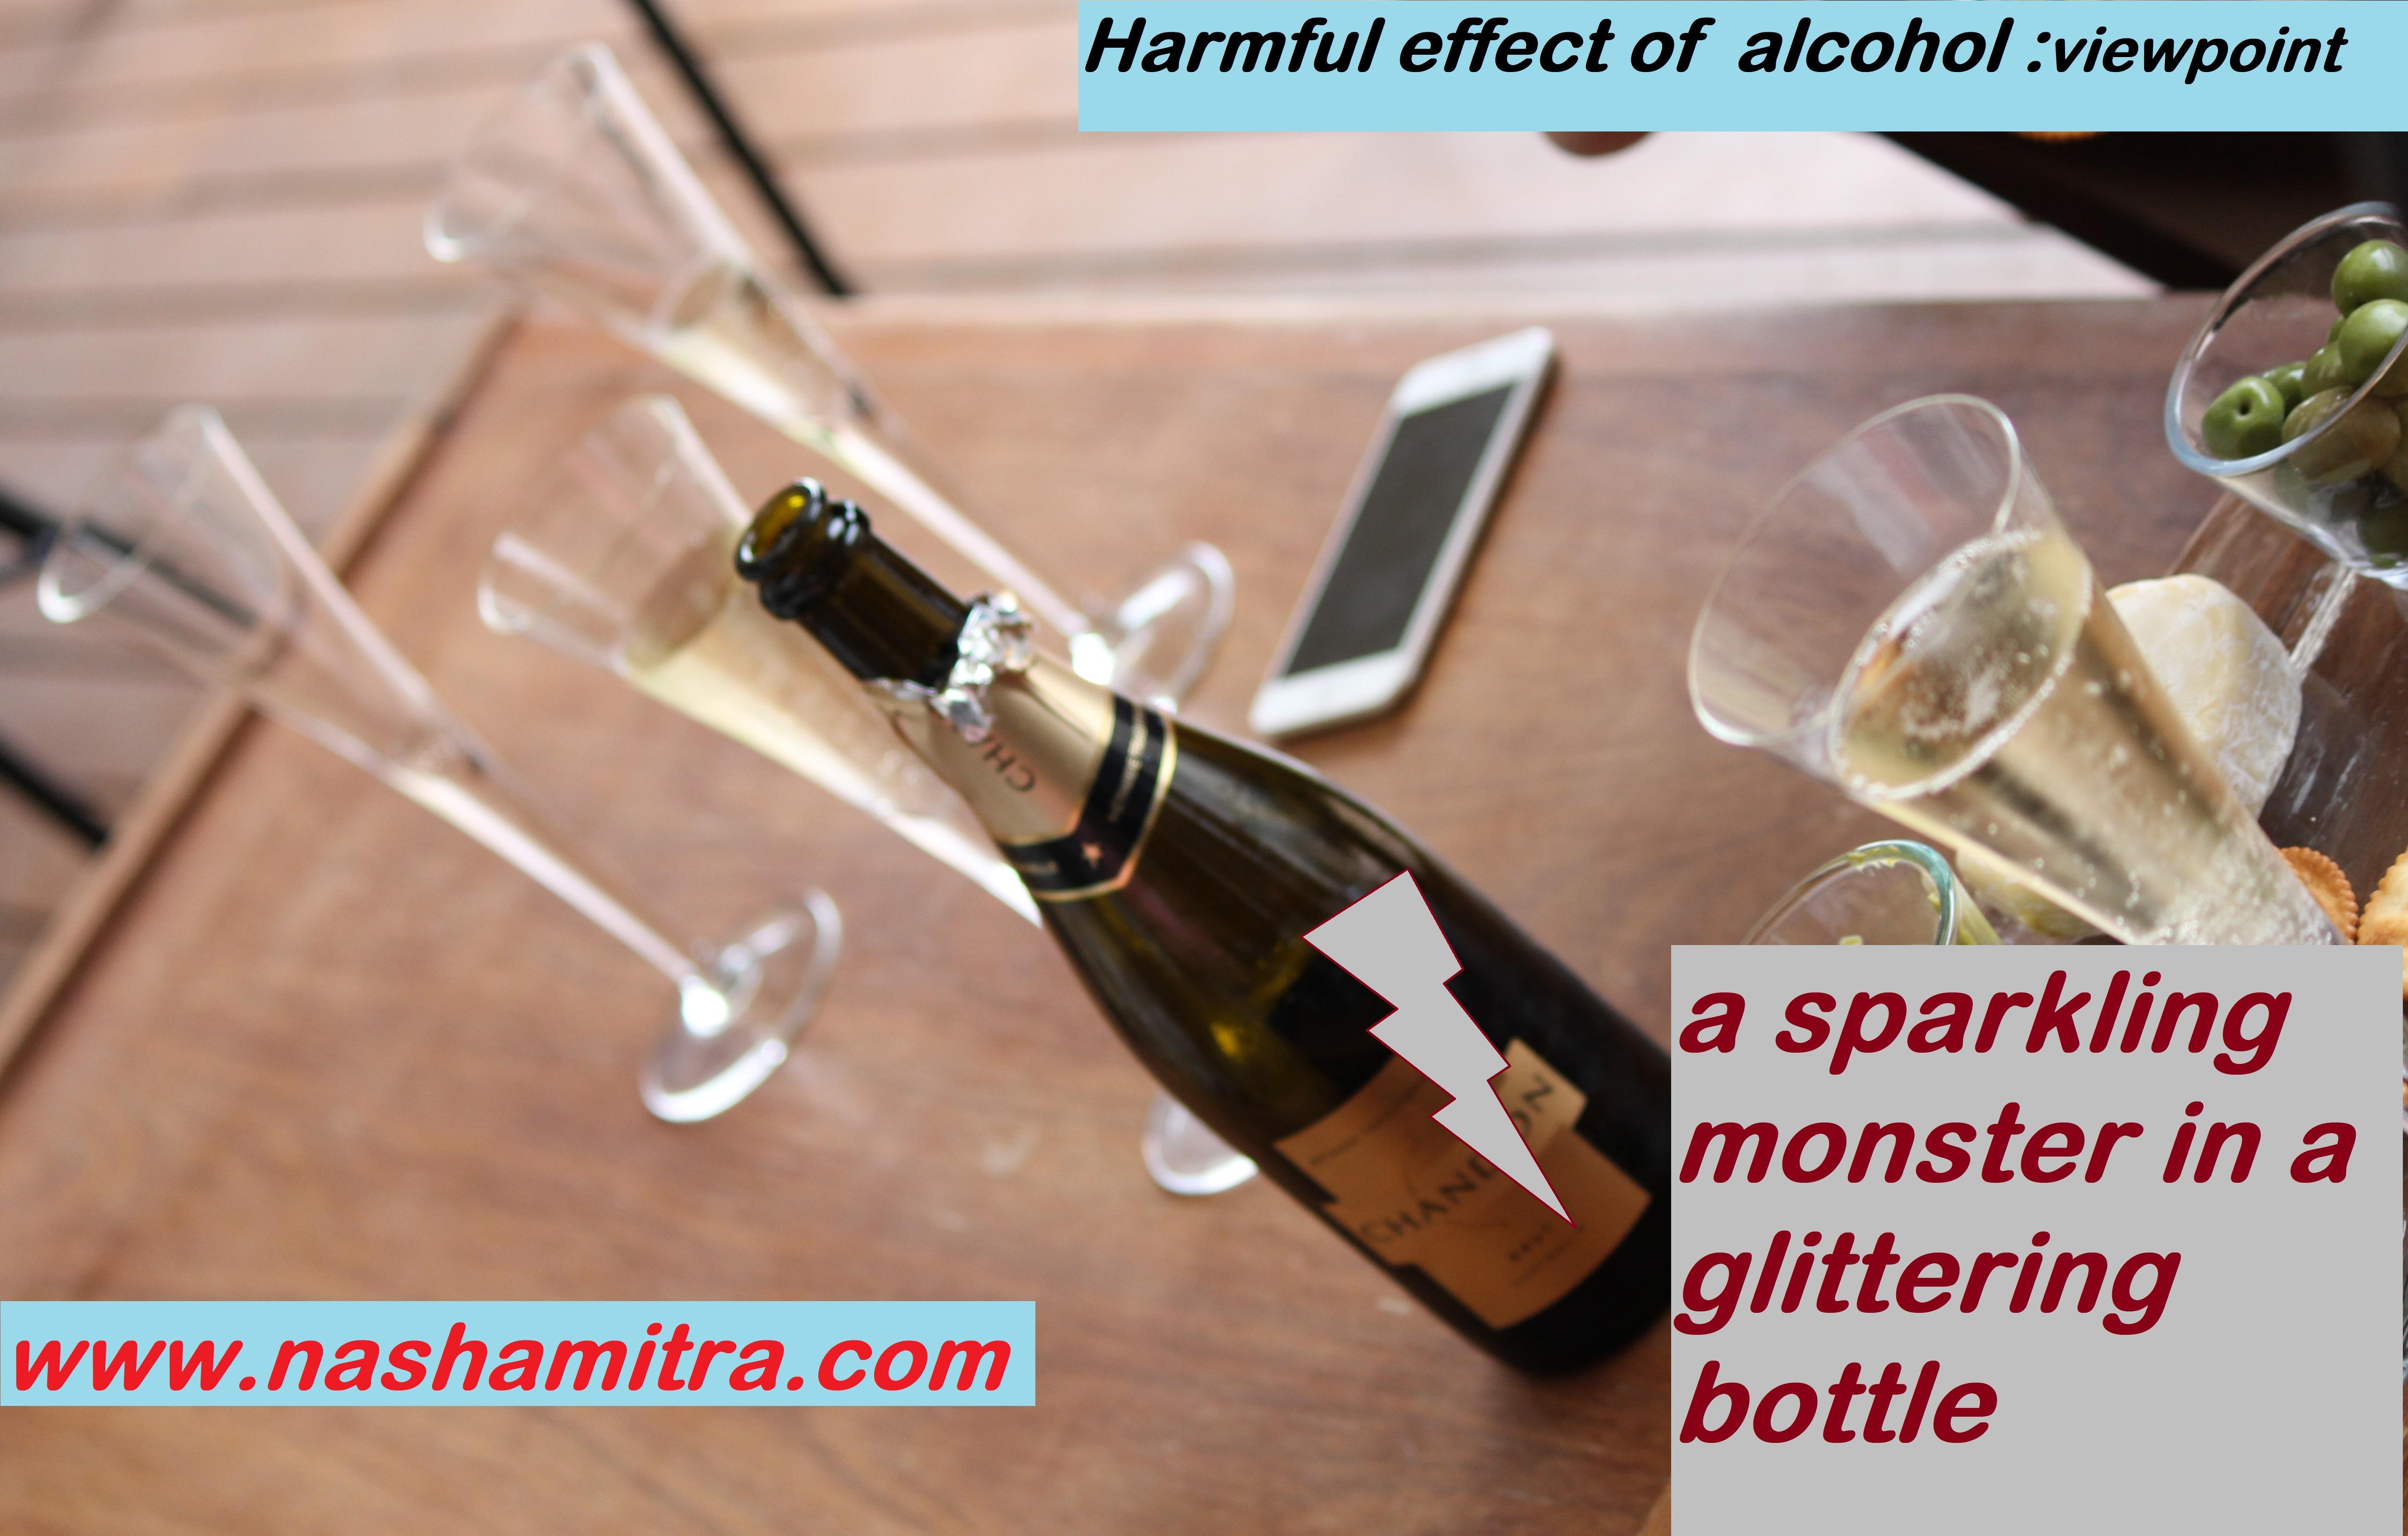 A sparkling monster sealed in a glittering bottle